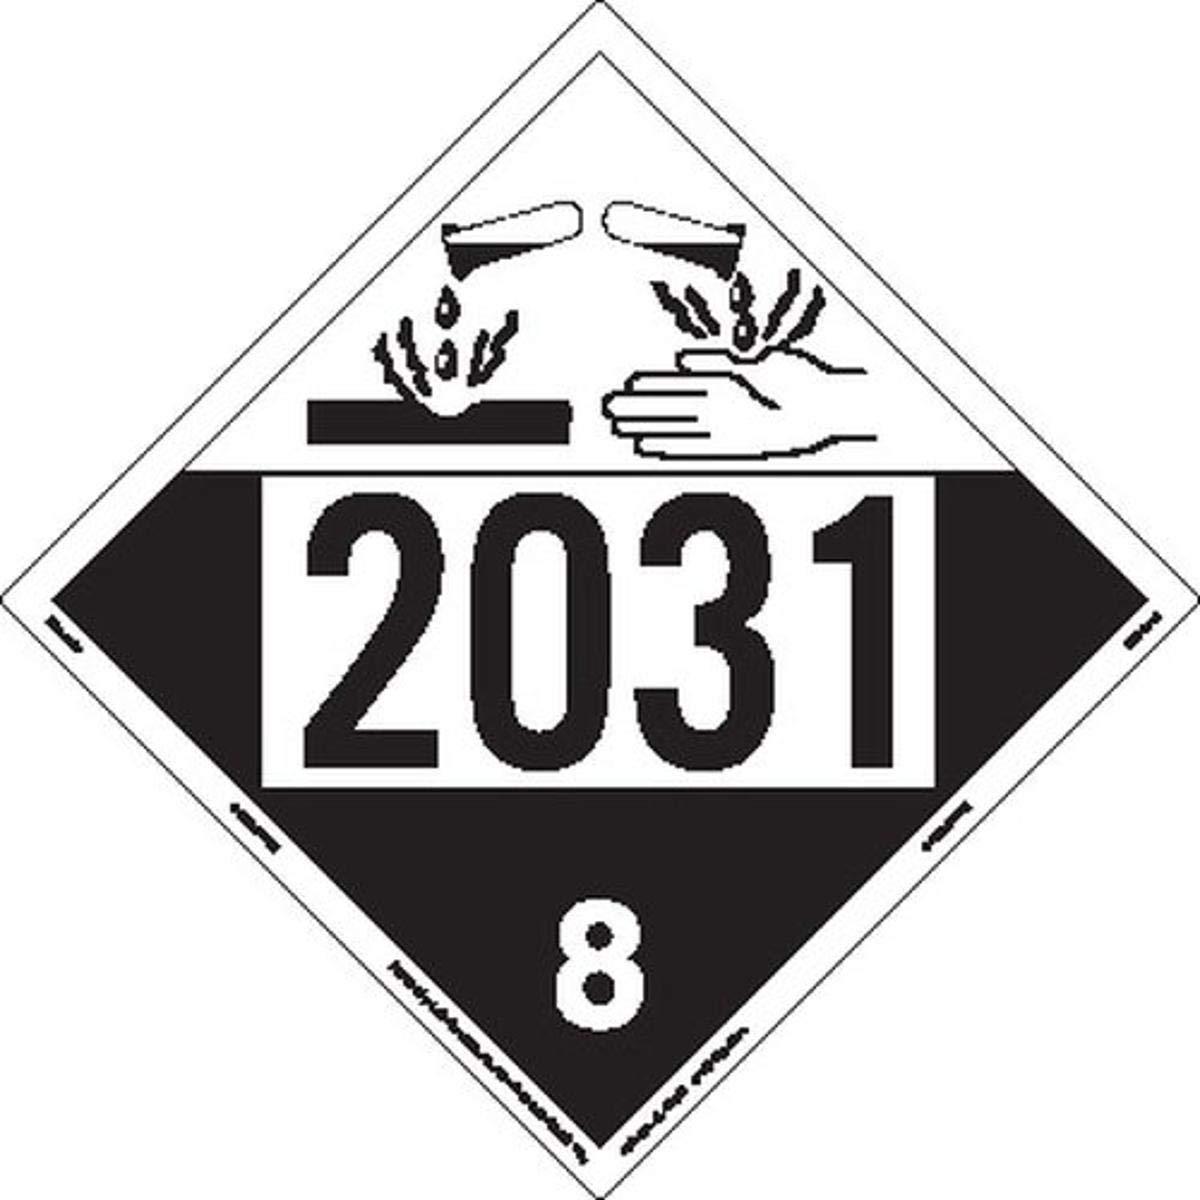 Labelmaster Max 44% OFF New products, world's highest quality popular! ZT4-2031 UN 2031 Hazmat Tagboard Corrosive Placard